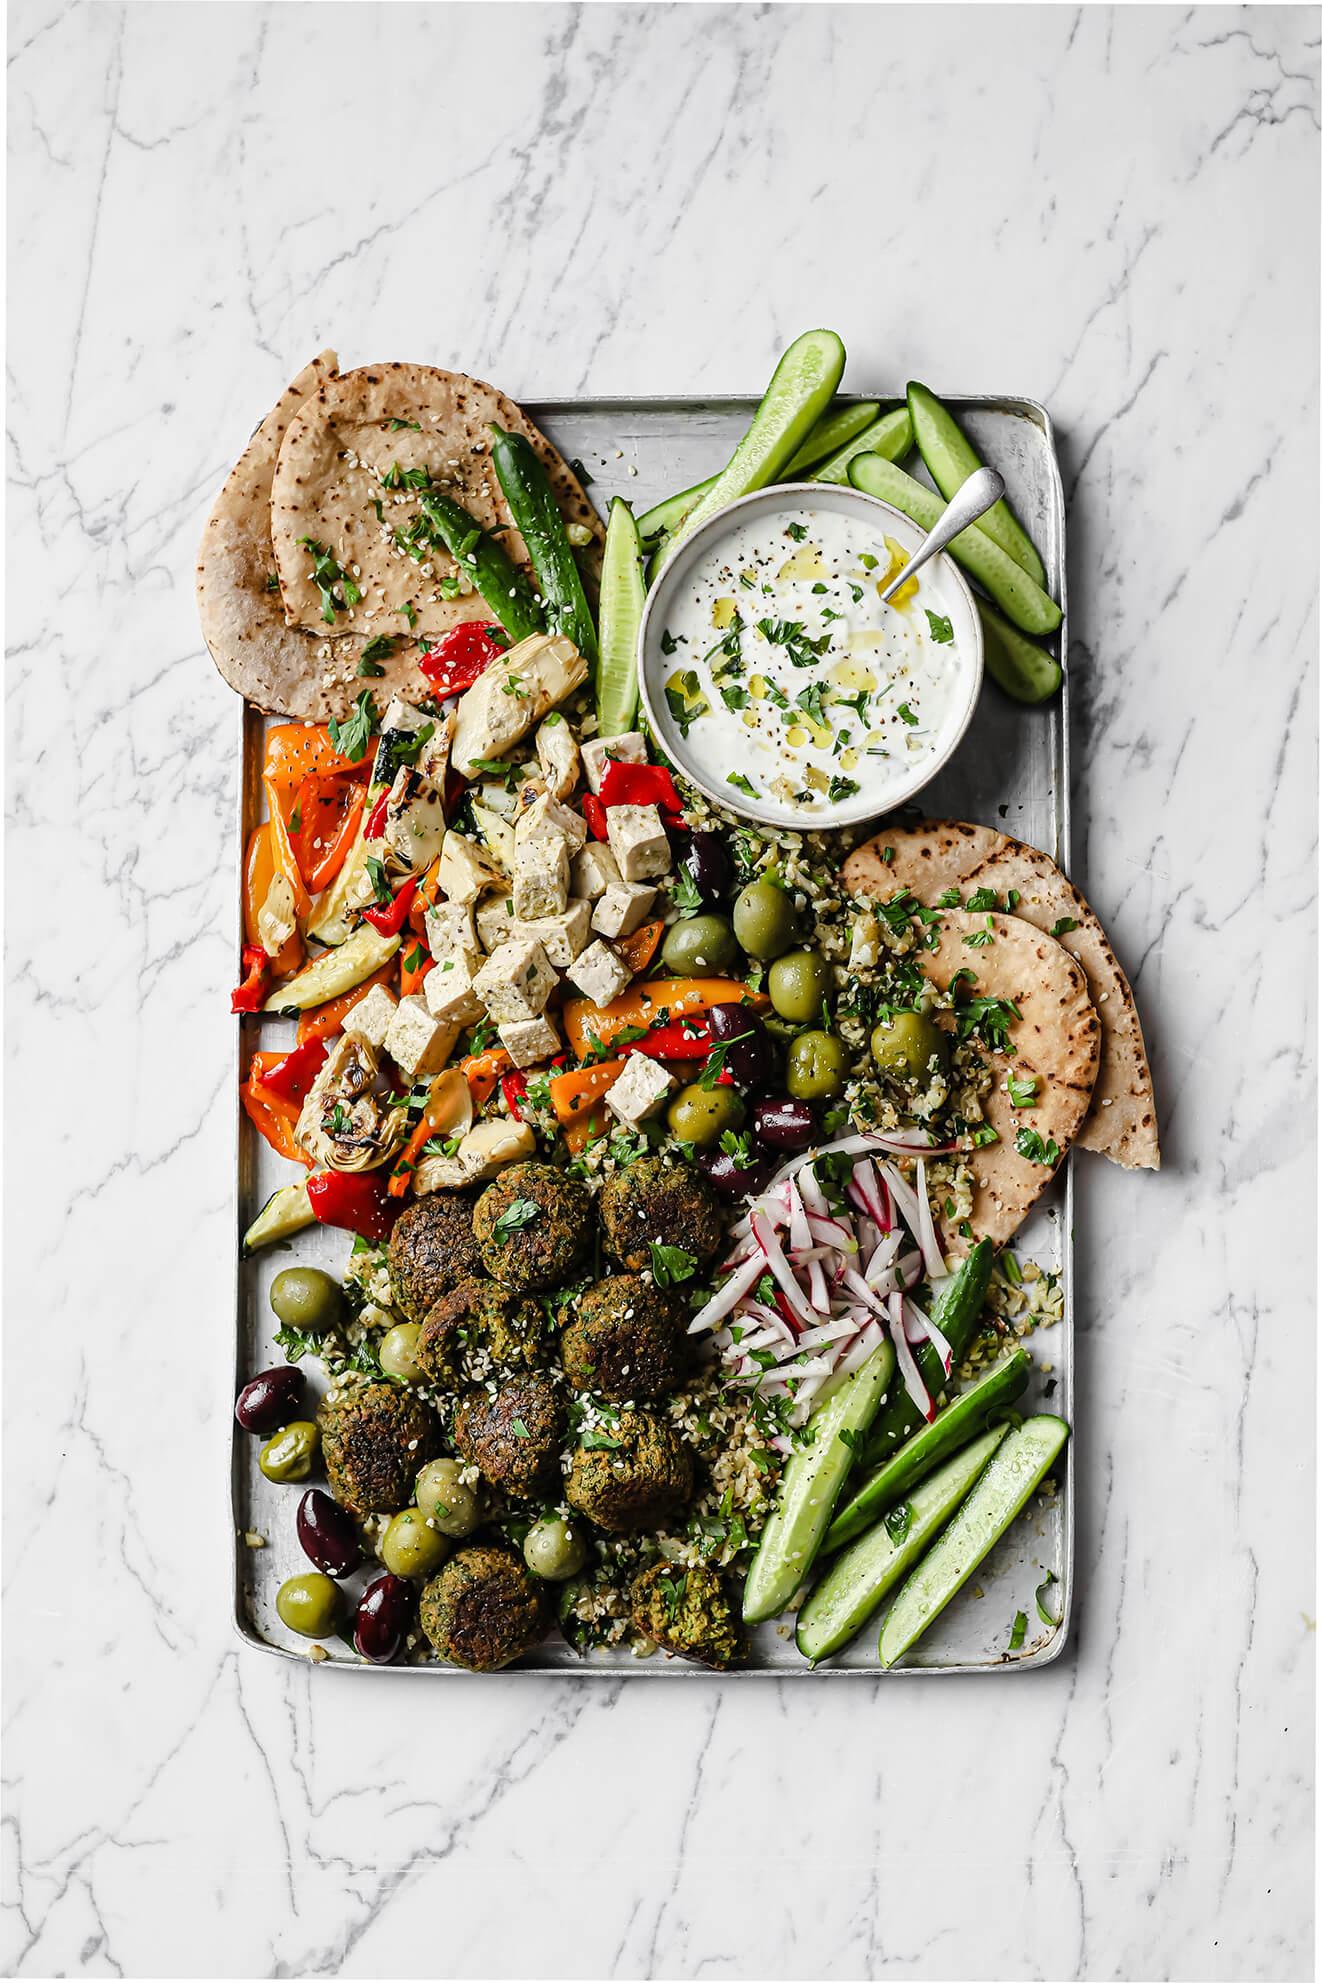 Falafel mezze food photography